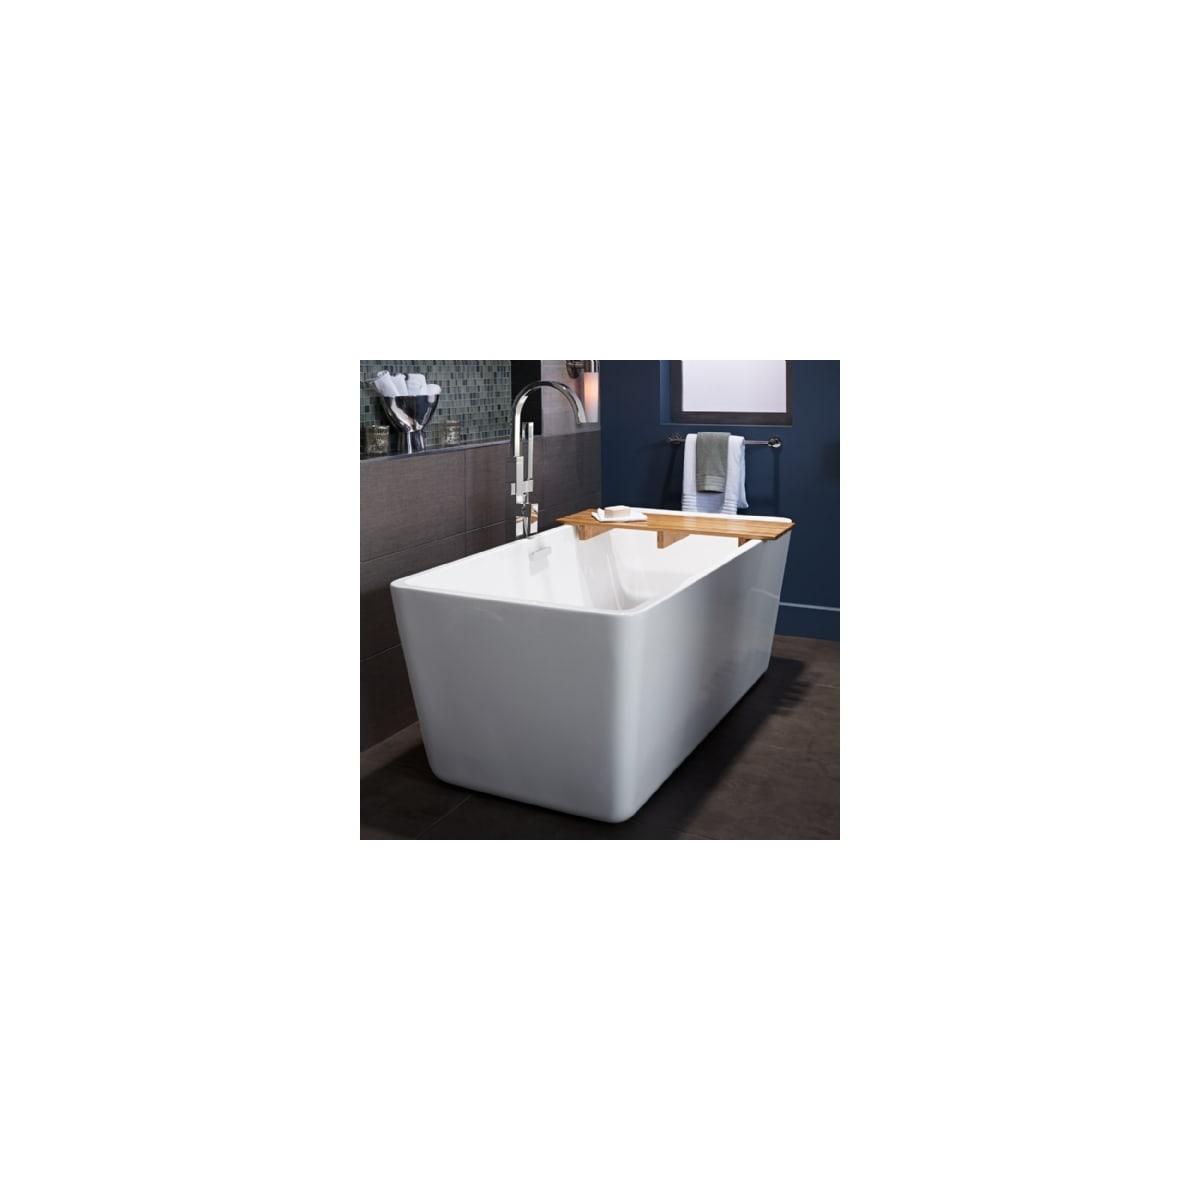 American Standard 2766.034.020 White Sedona Loft 62-3/4\